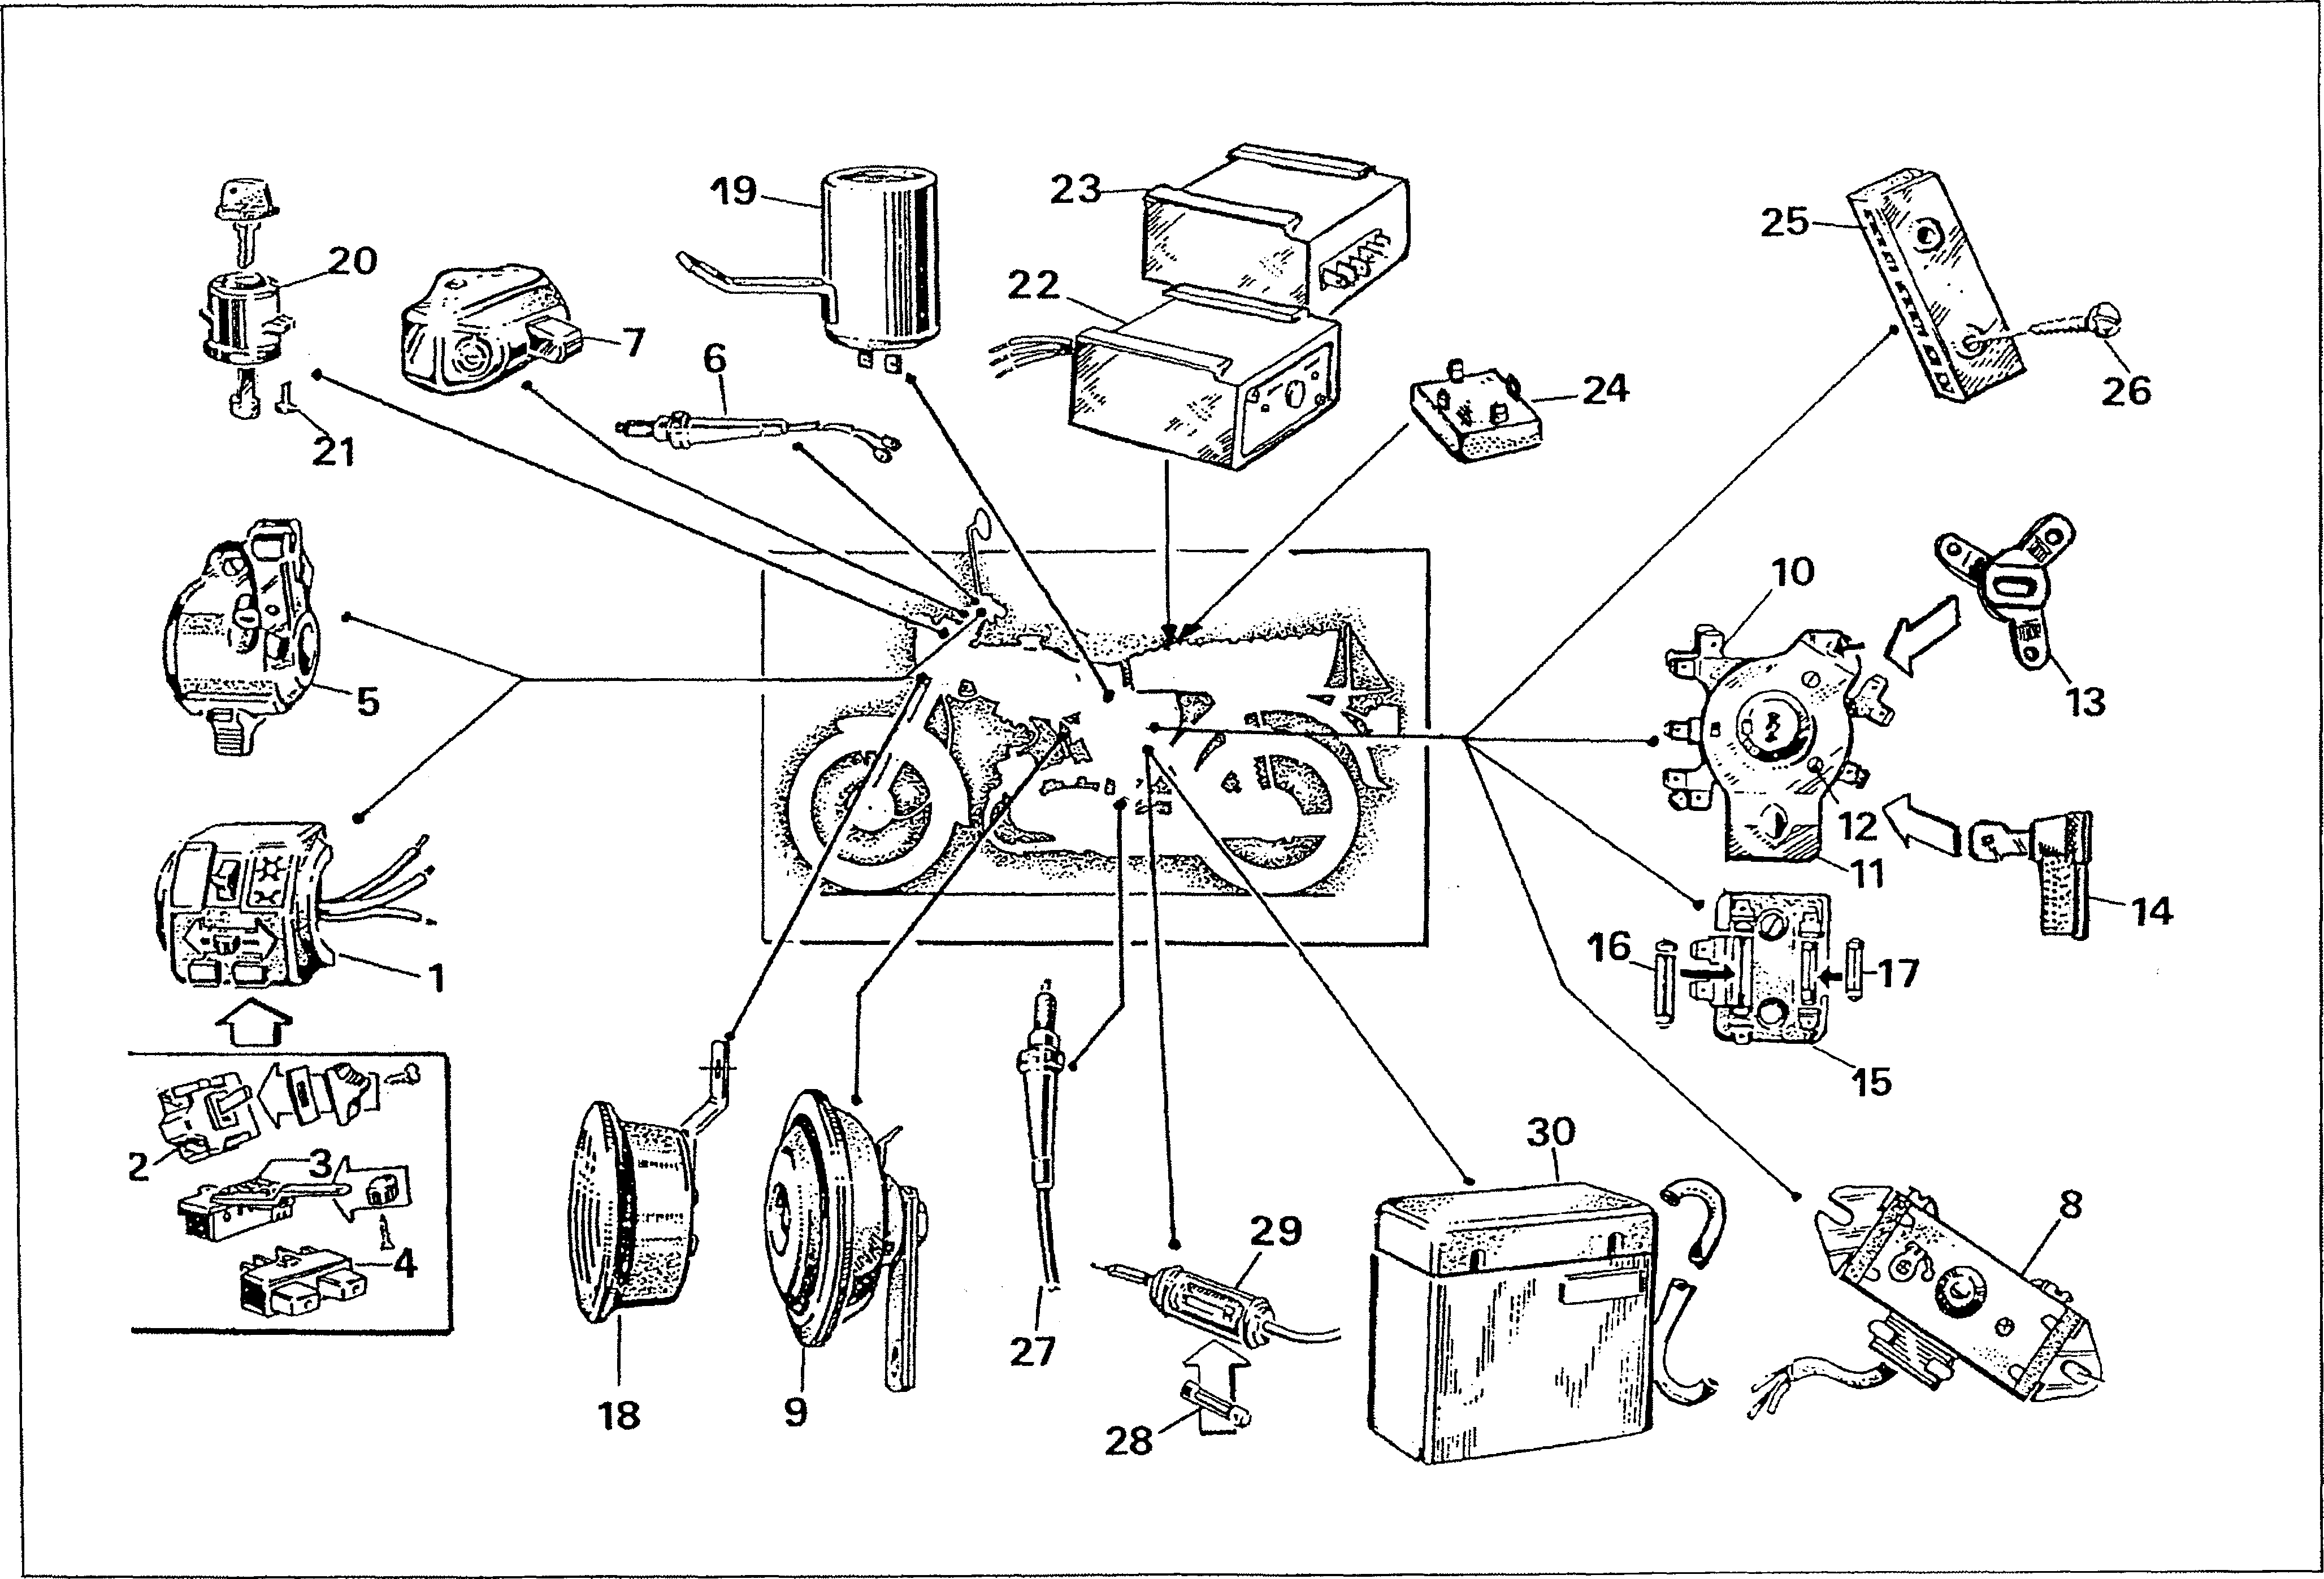 Simson S51 - Electrical equipment